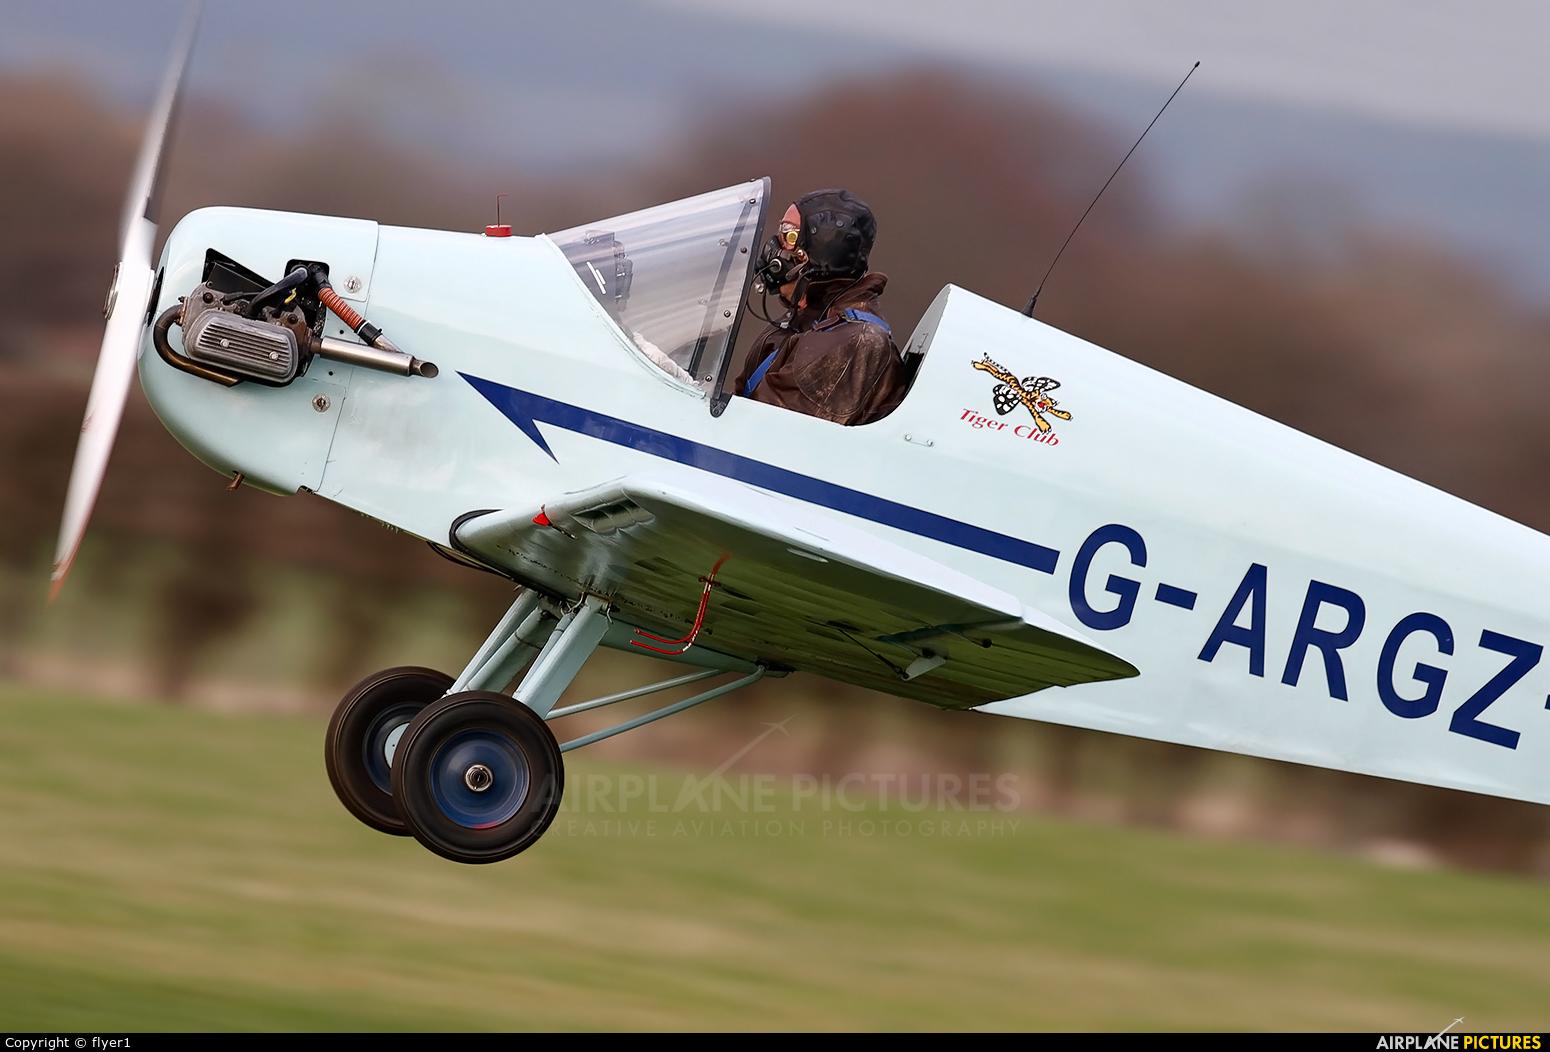 Private G-ARGZ aircraft at Lashenden / Headcorn